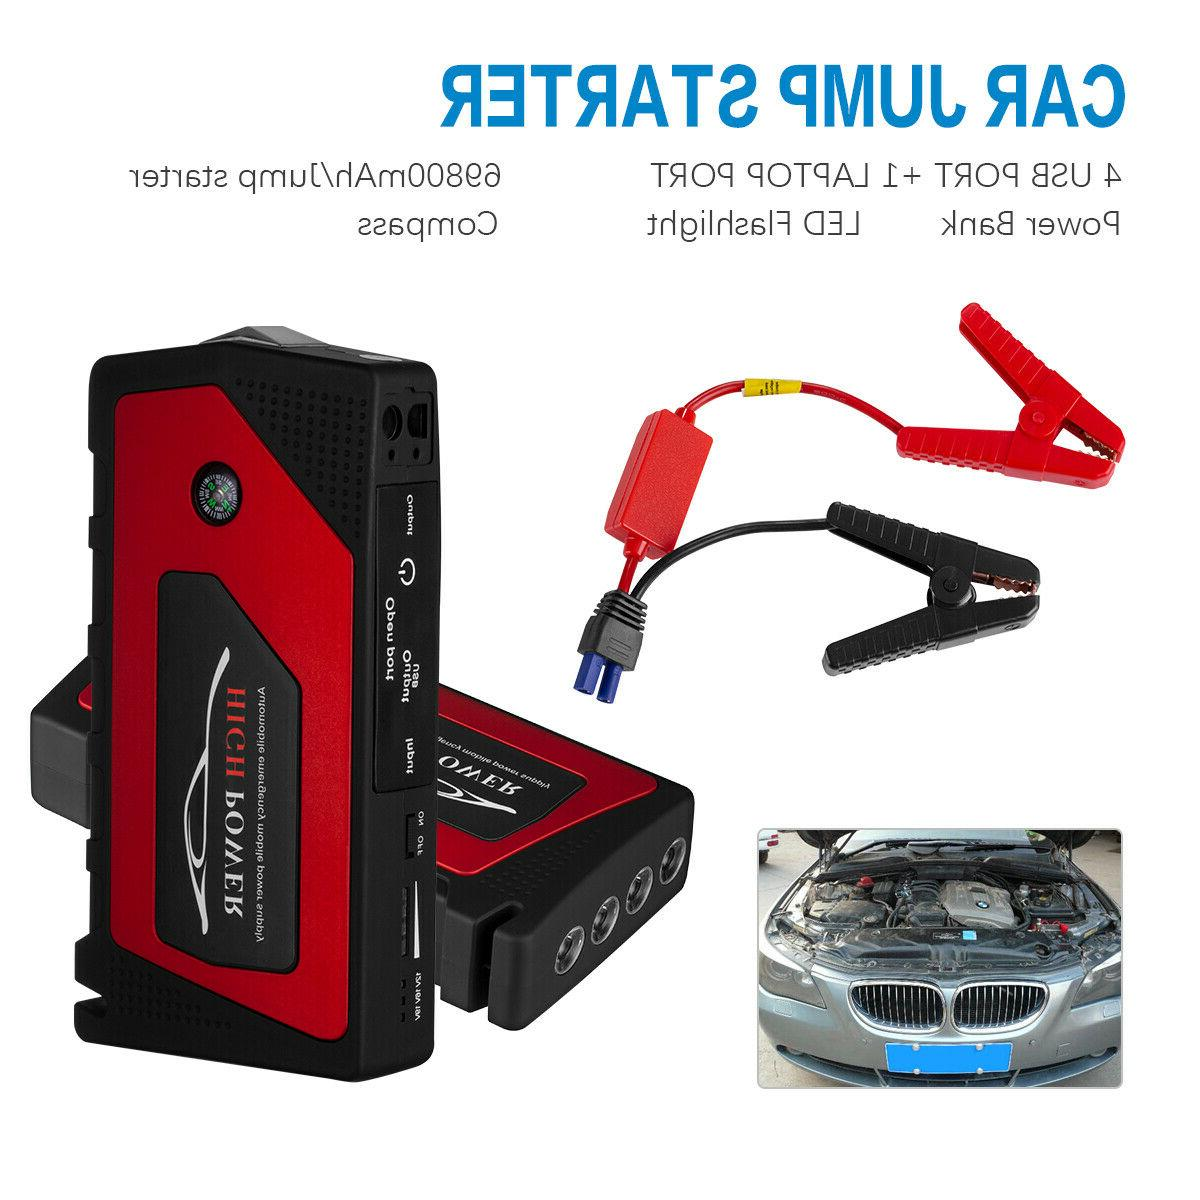 69800mAh Starter Portable Bank Battery Clamp